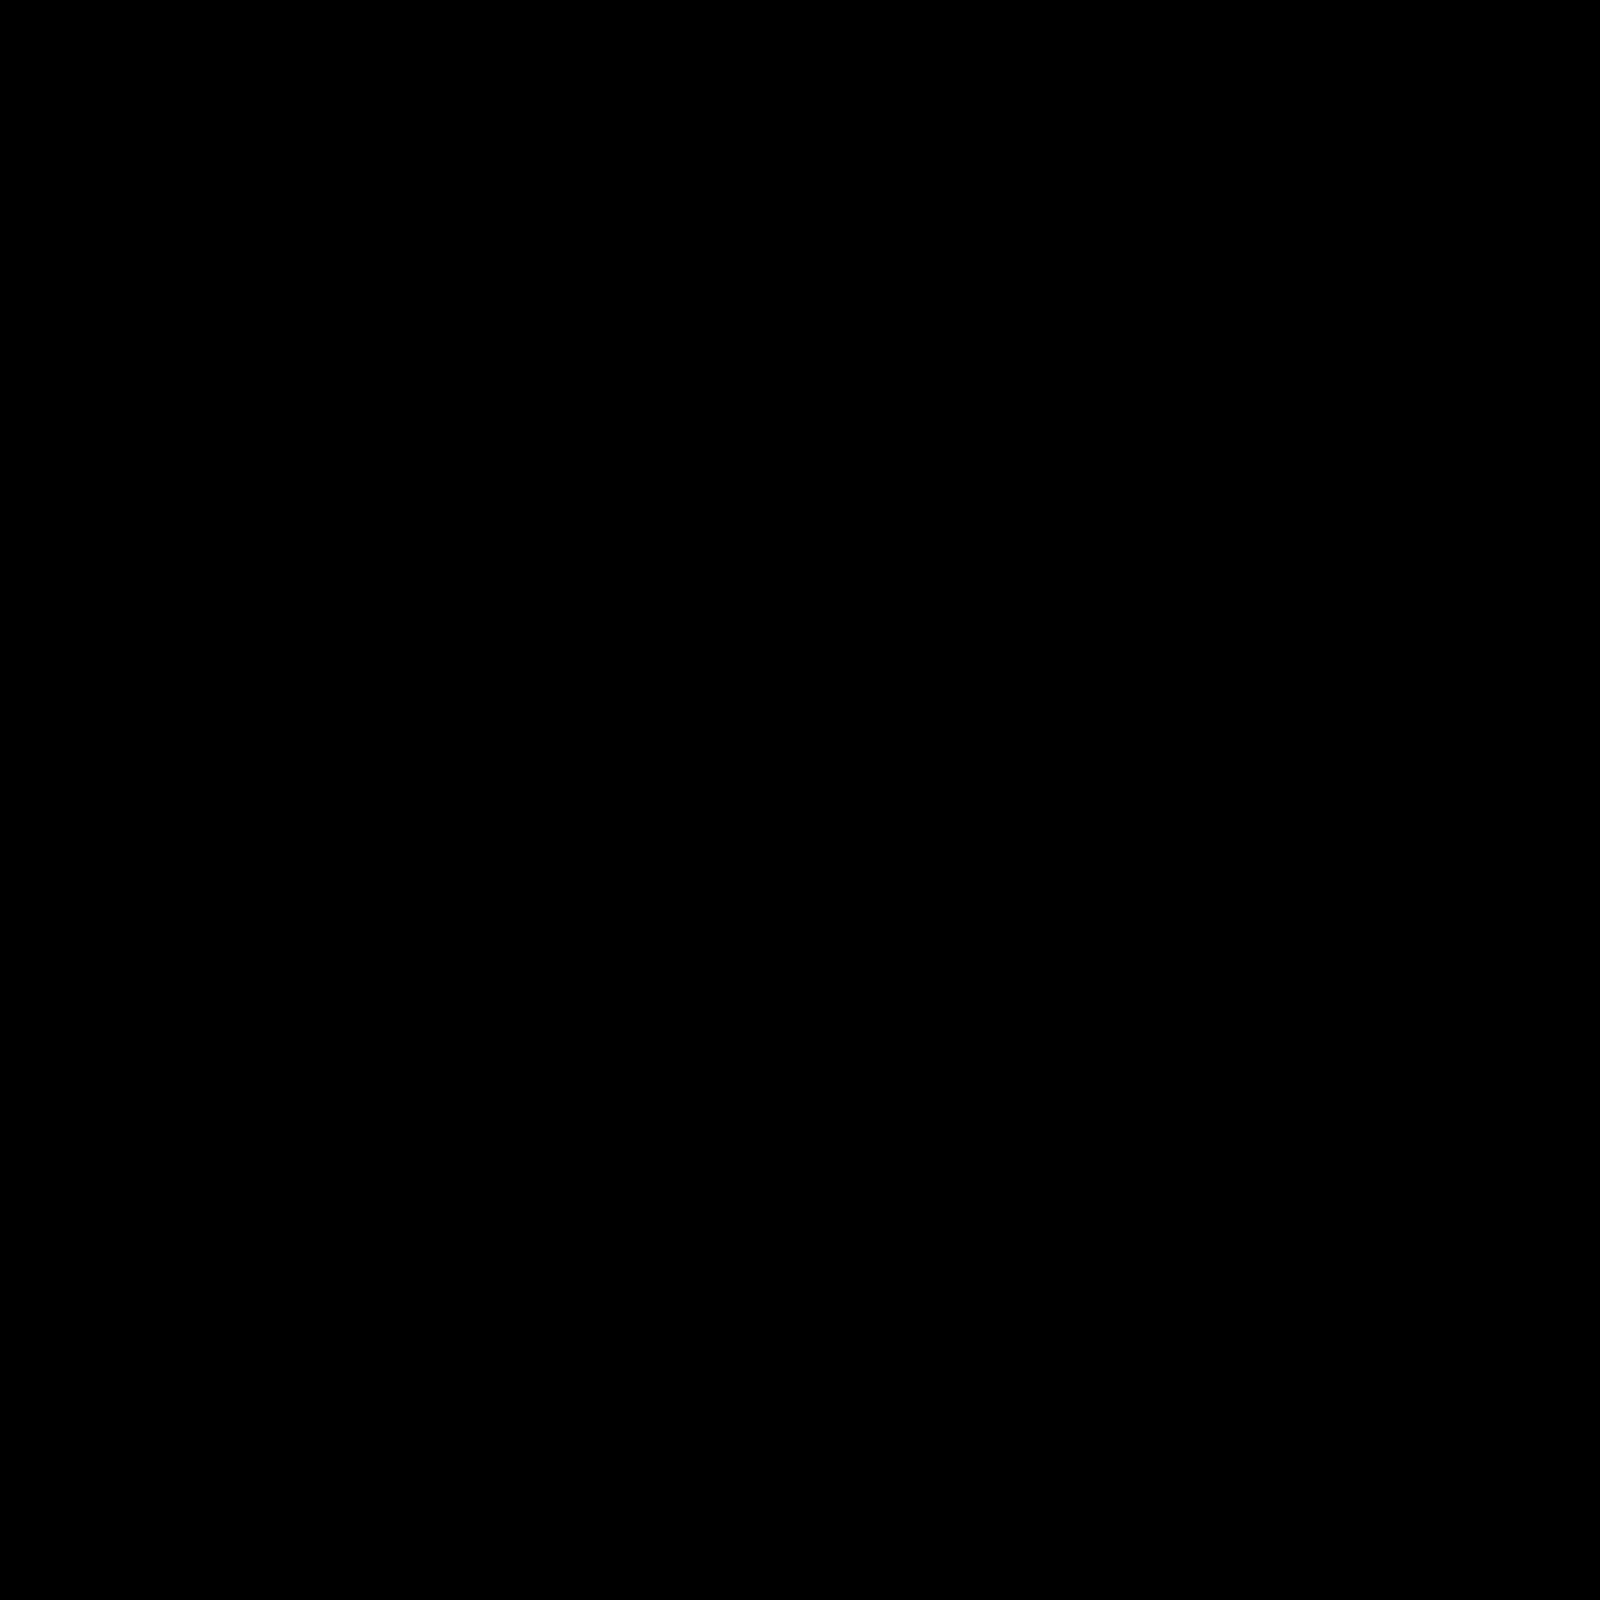 Poprzedni icon